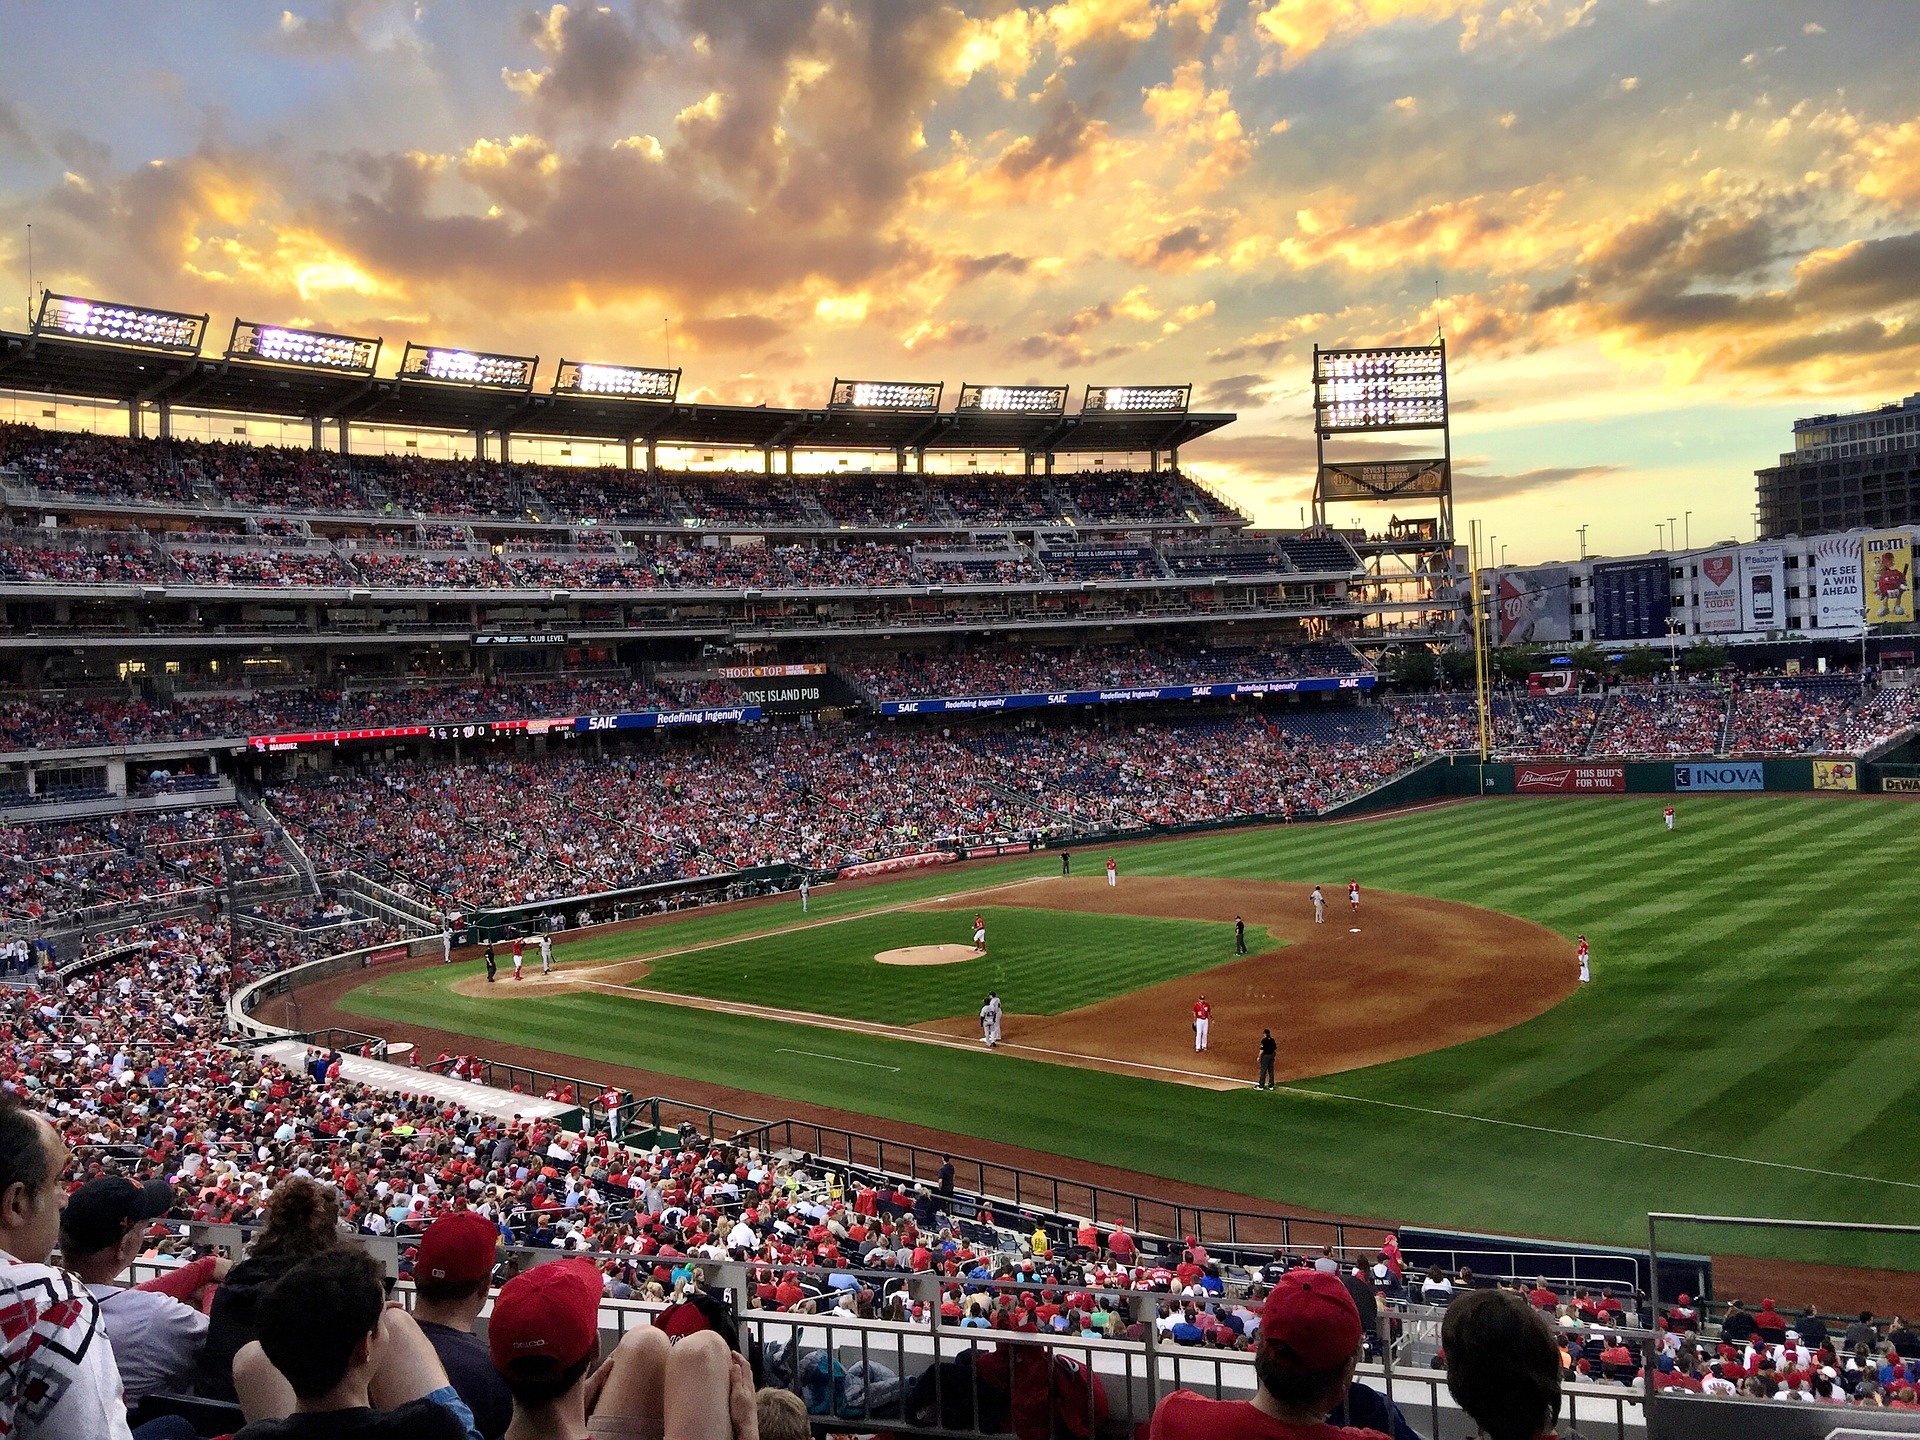 Sunset baseball